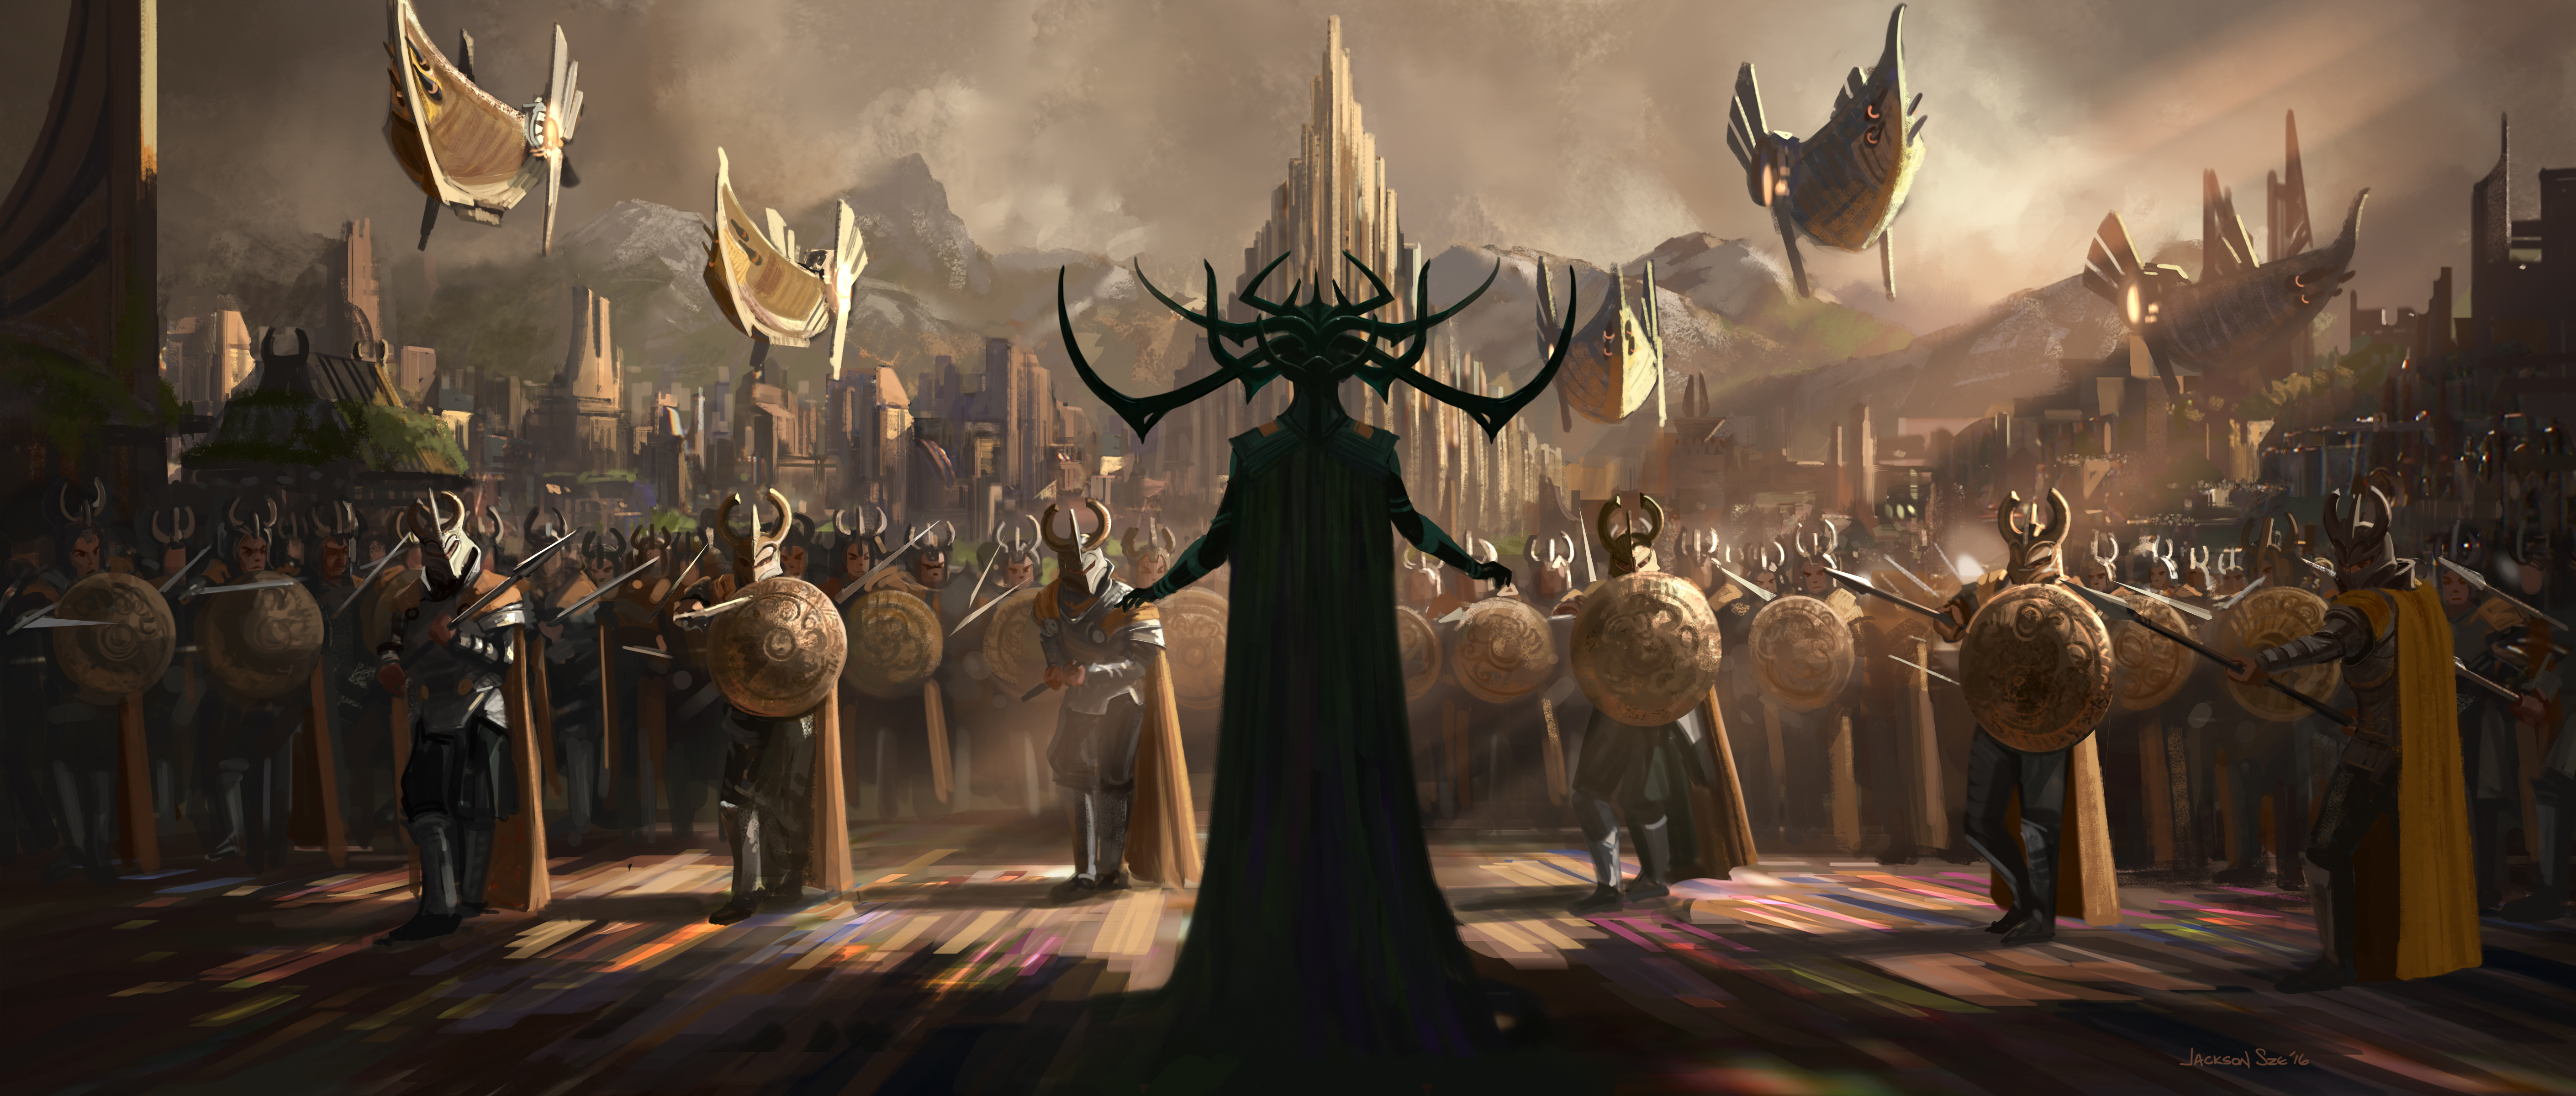 Hela Marvel Comics Thor Ragnarok Thor Marvel Comics 5640x2400